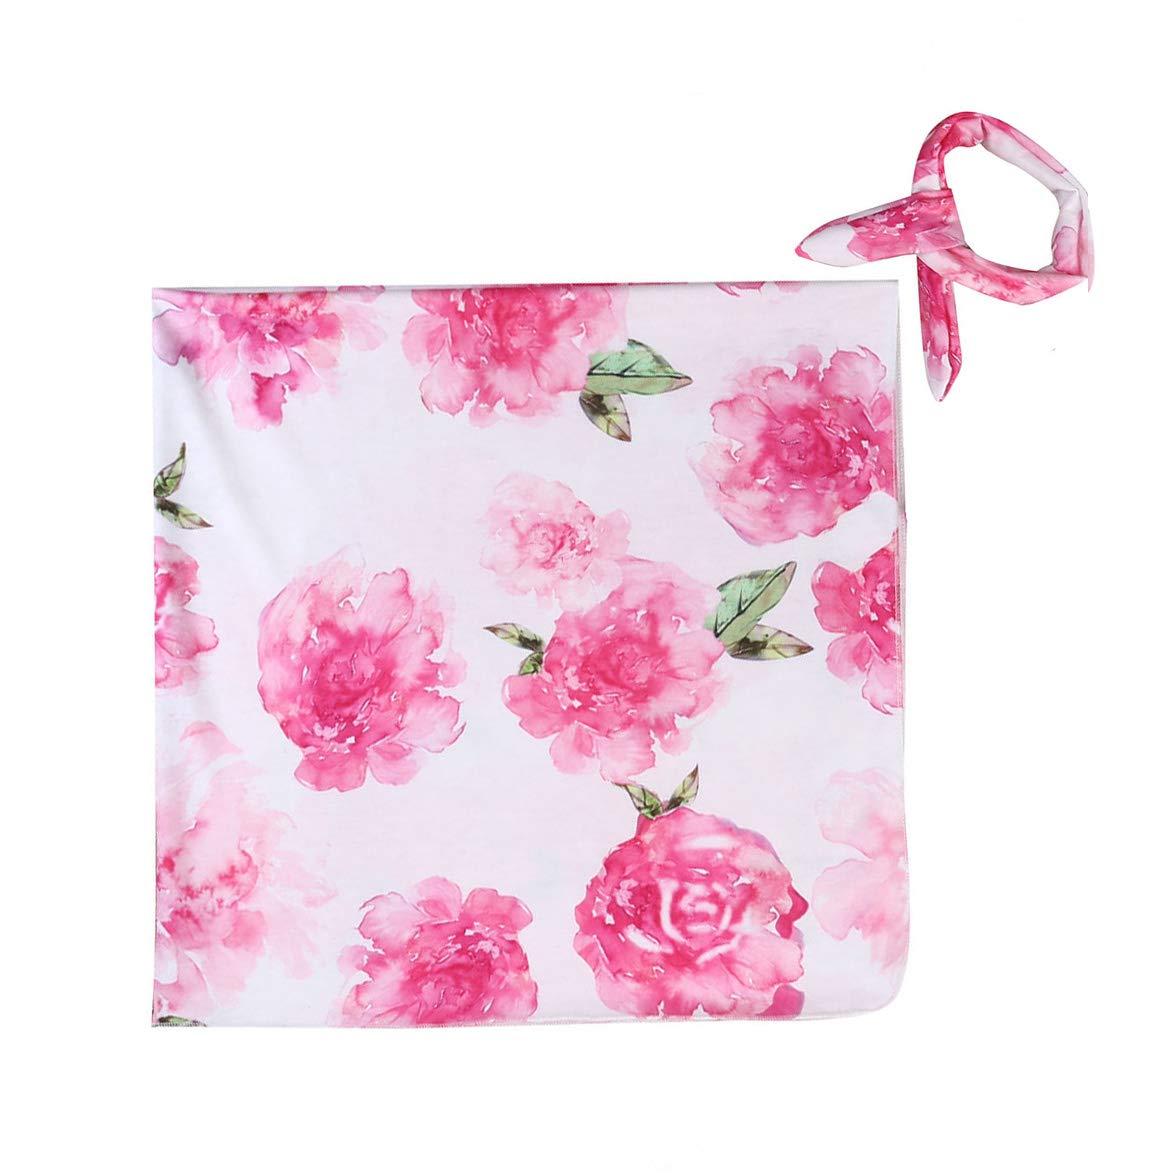 MAINESAKA SLEEPWEAR ベビーガールズ 0 - 3 Months Floral(pink) B07NY14JYQ